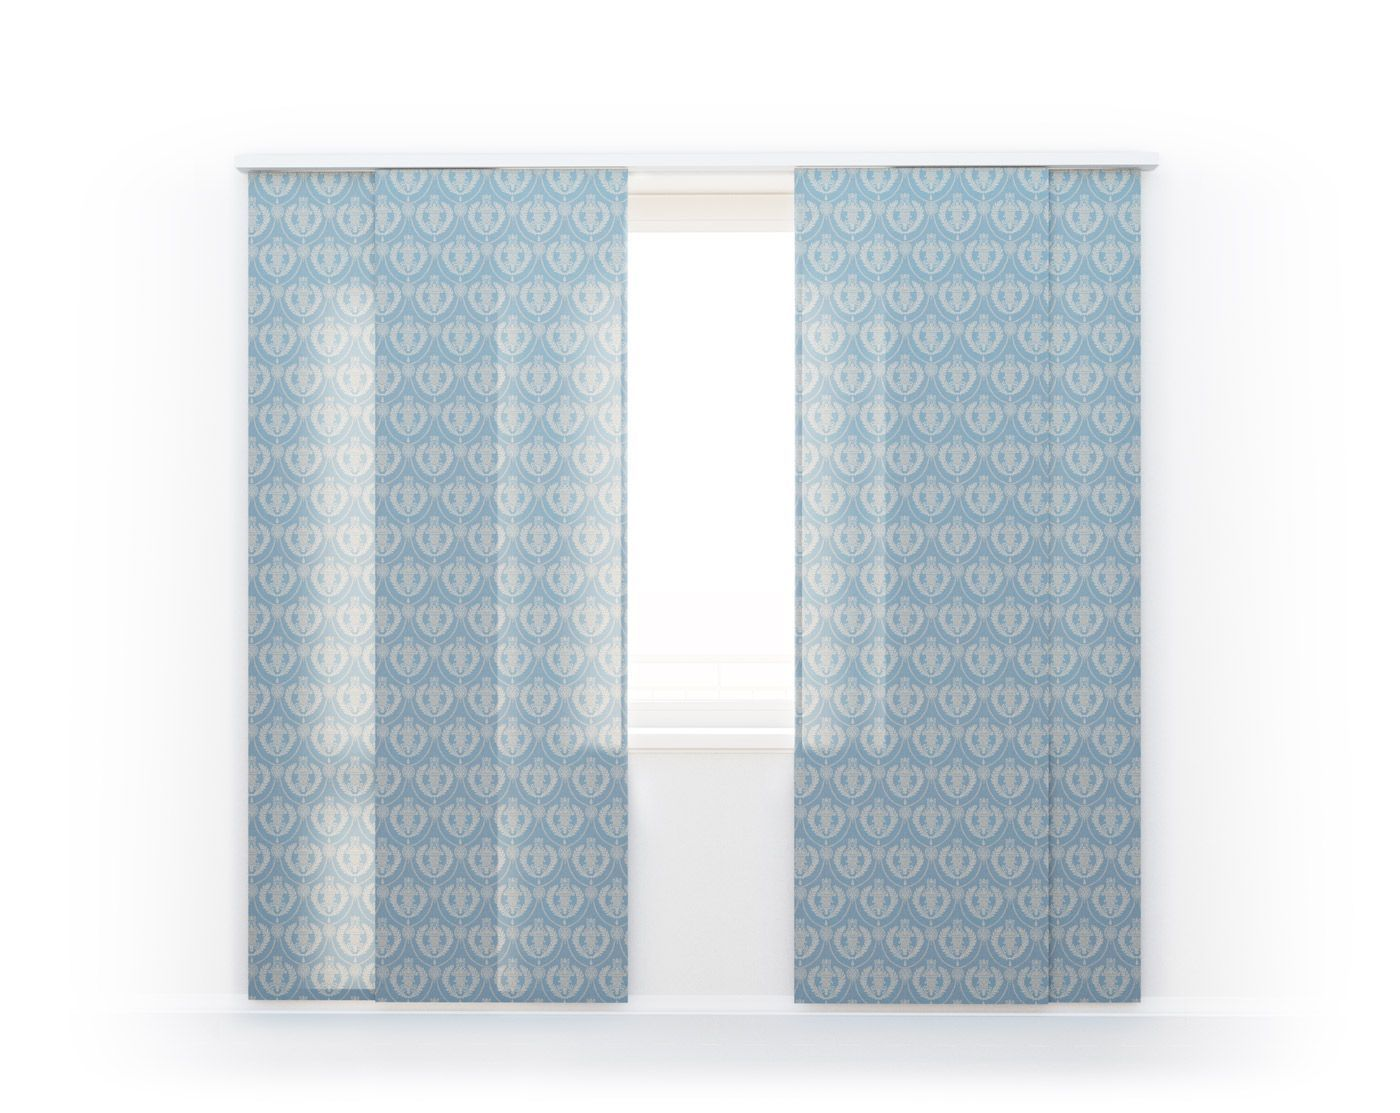 Японские шторы Louis D'or, 2381/41